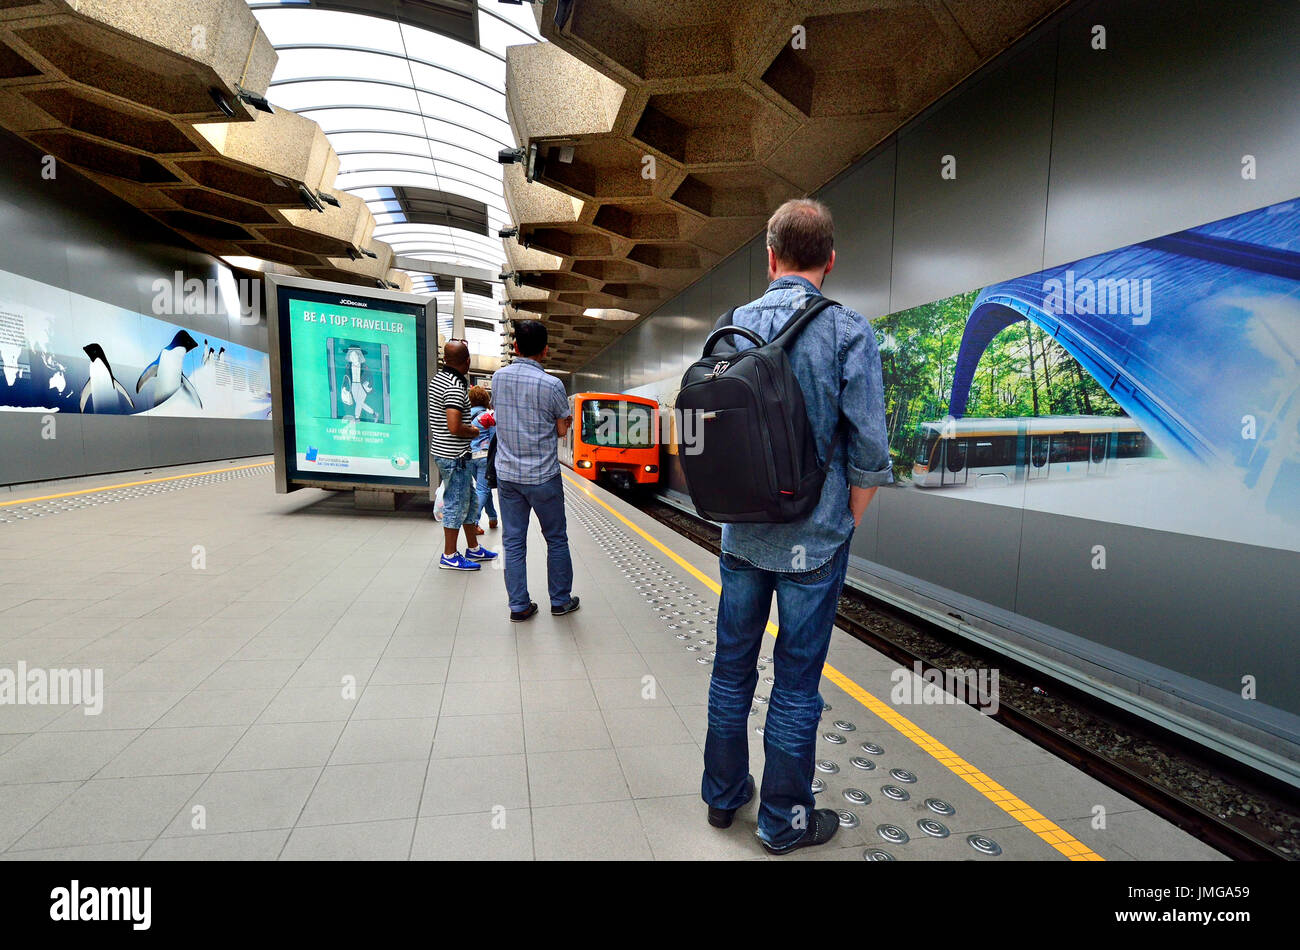 Brussels, Belgium. Belgica metro station - train arriving at the platform - Stock Image